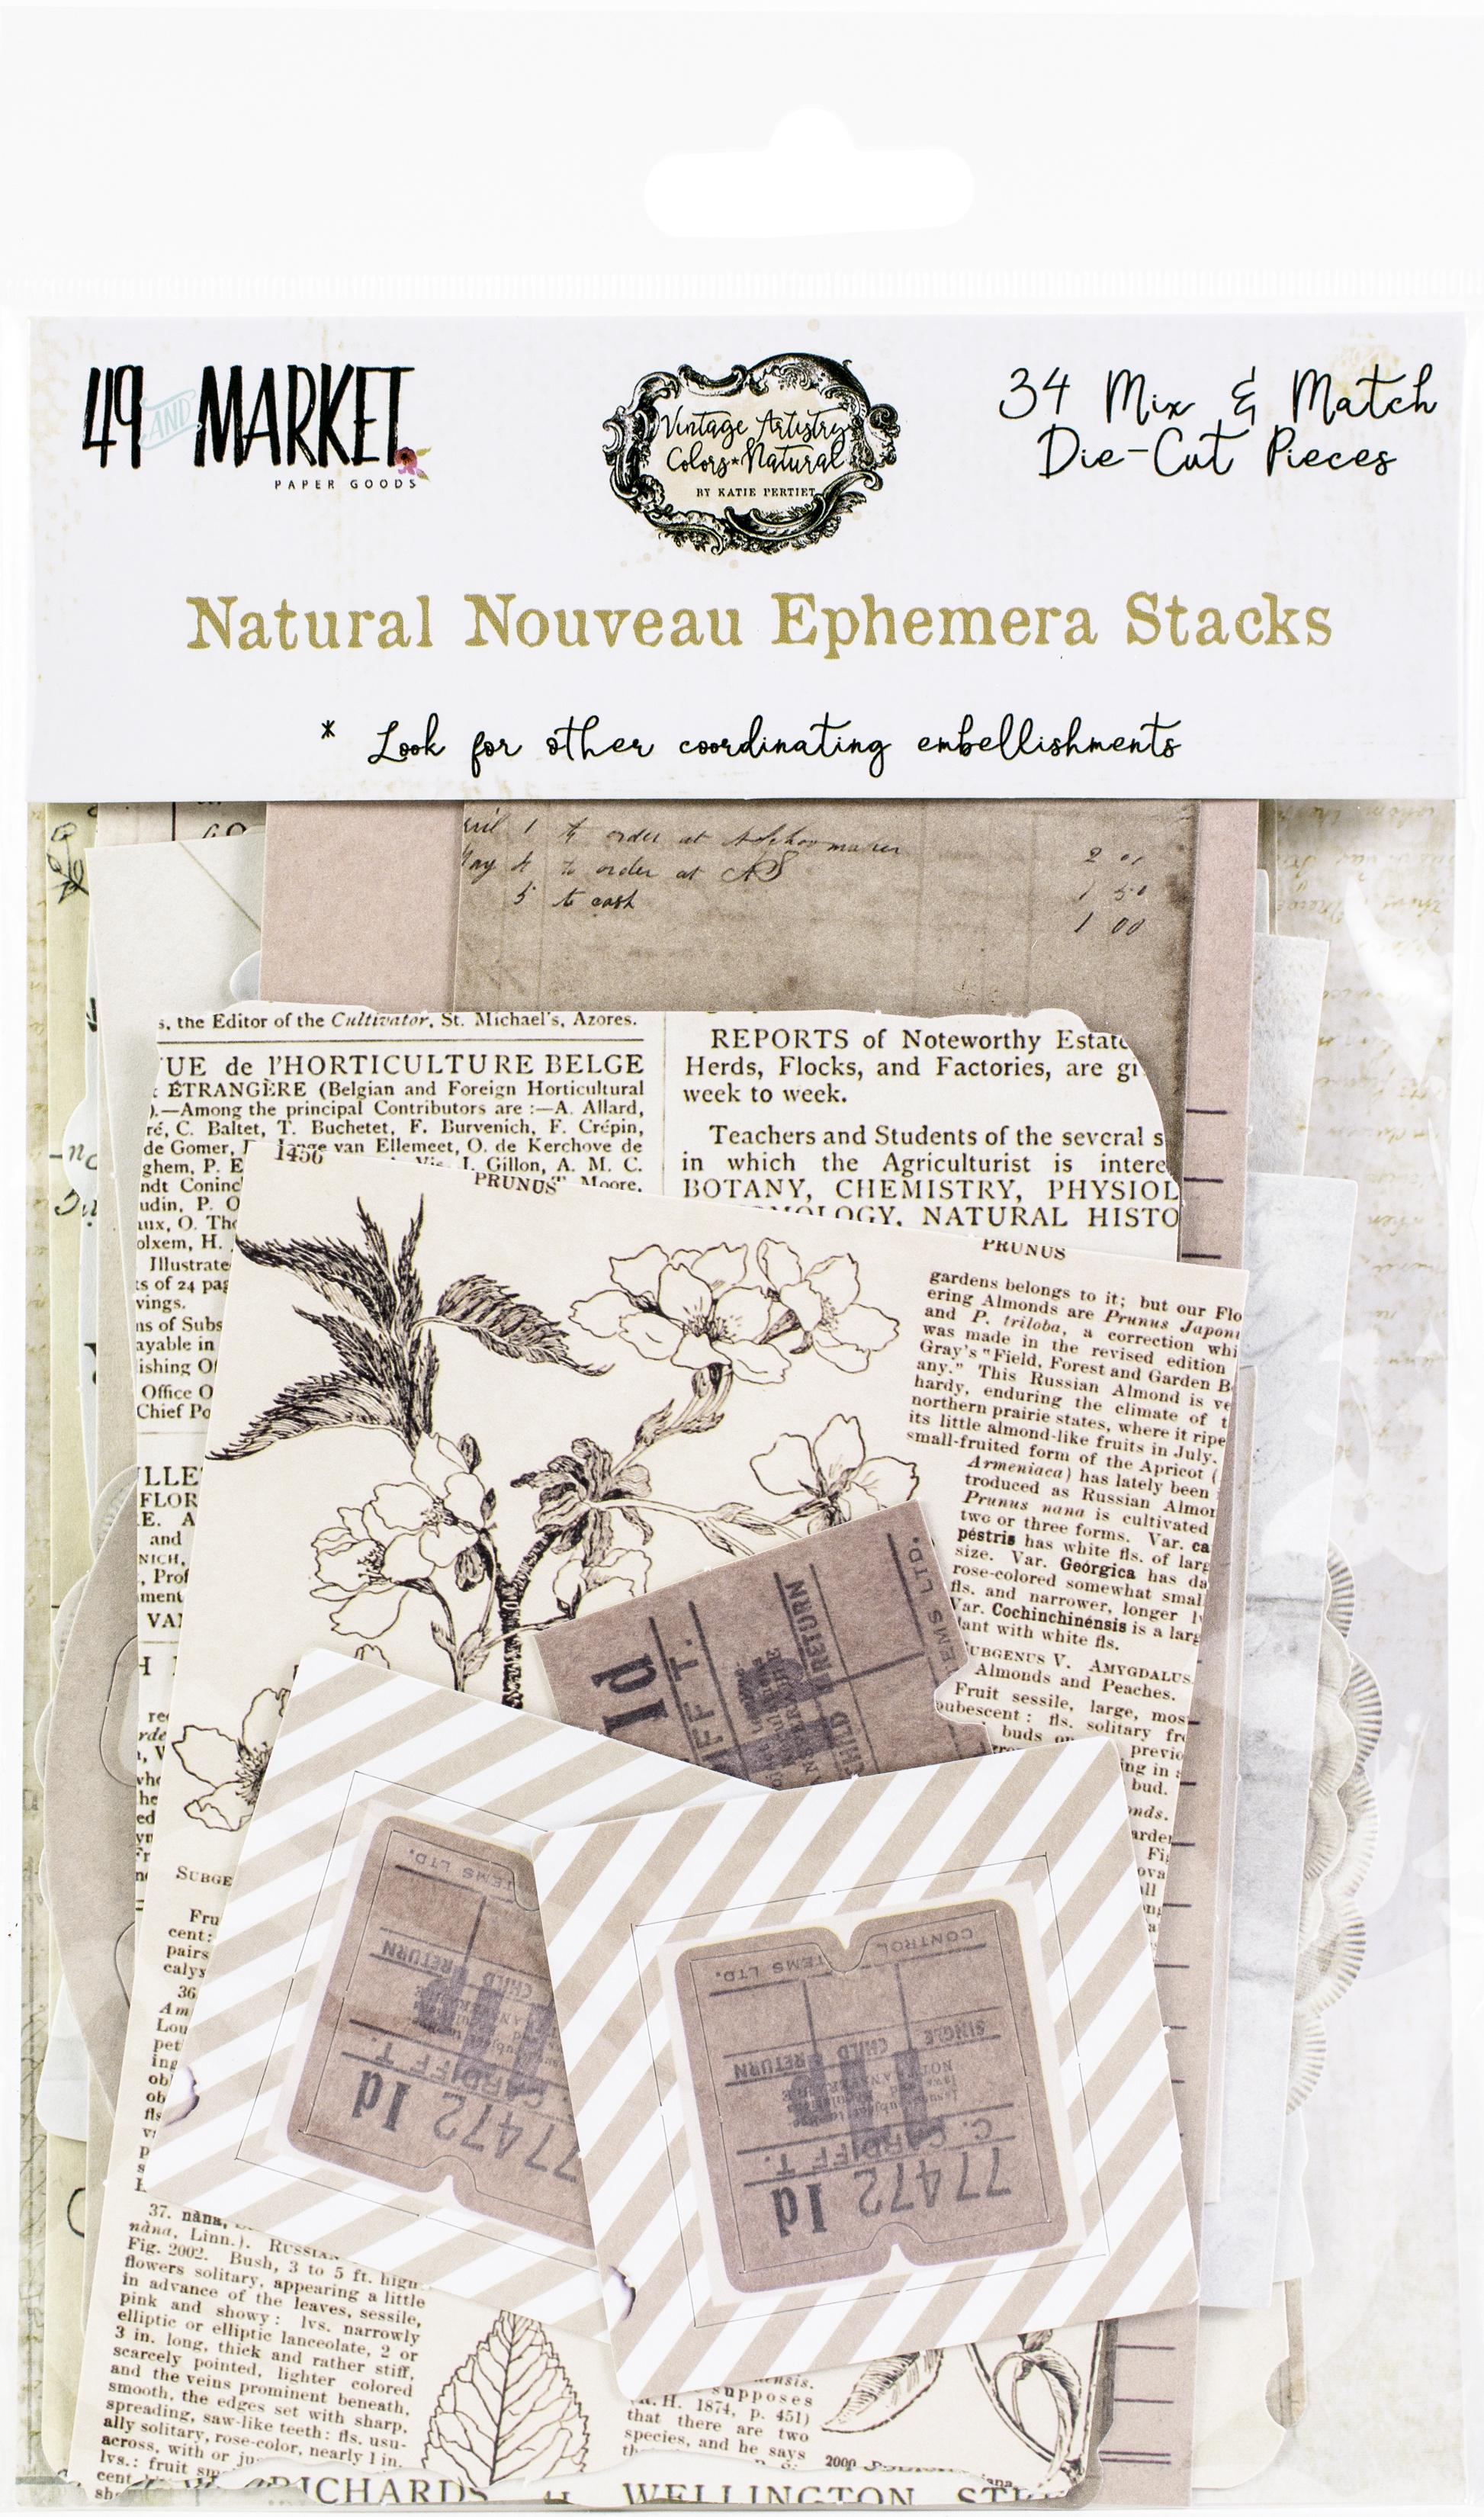 49 And Market - Natural Nouveau Ephemera Stacks